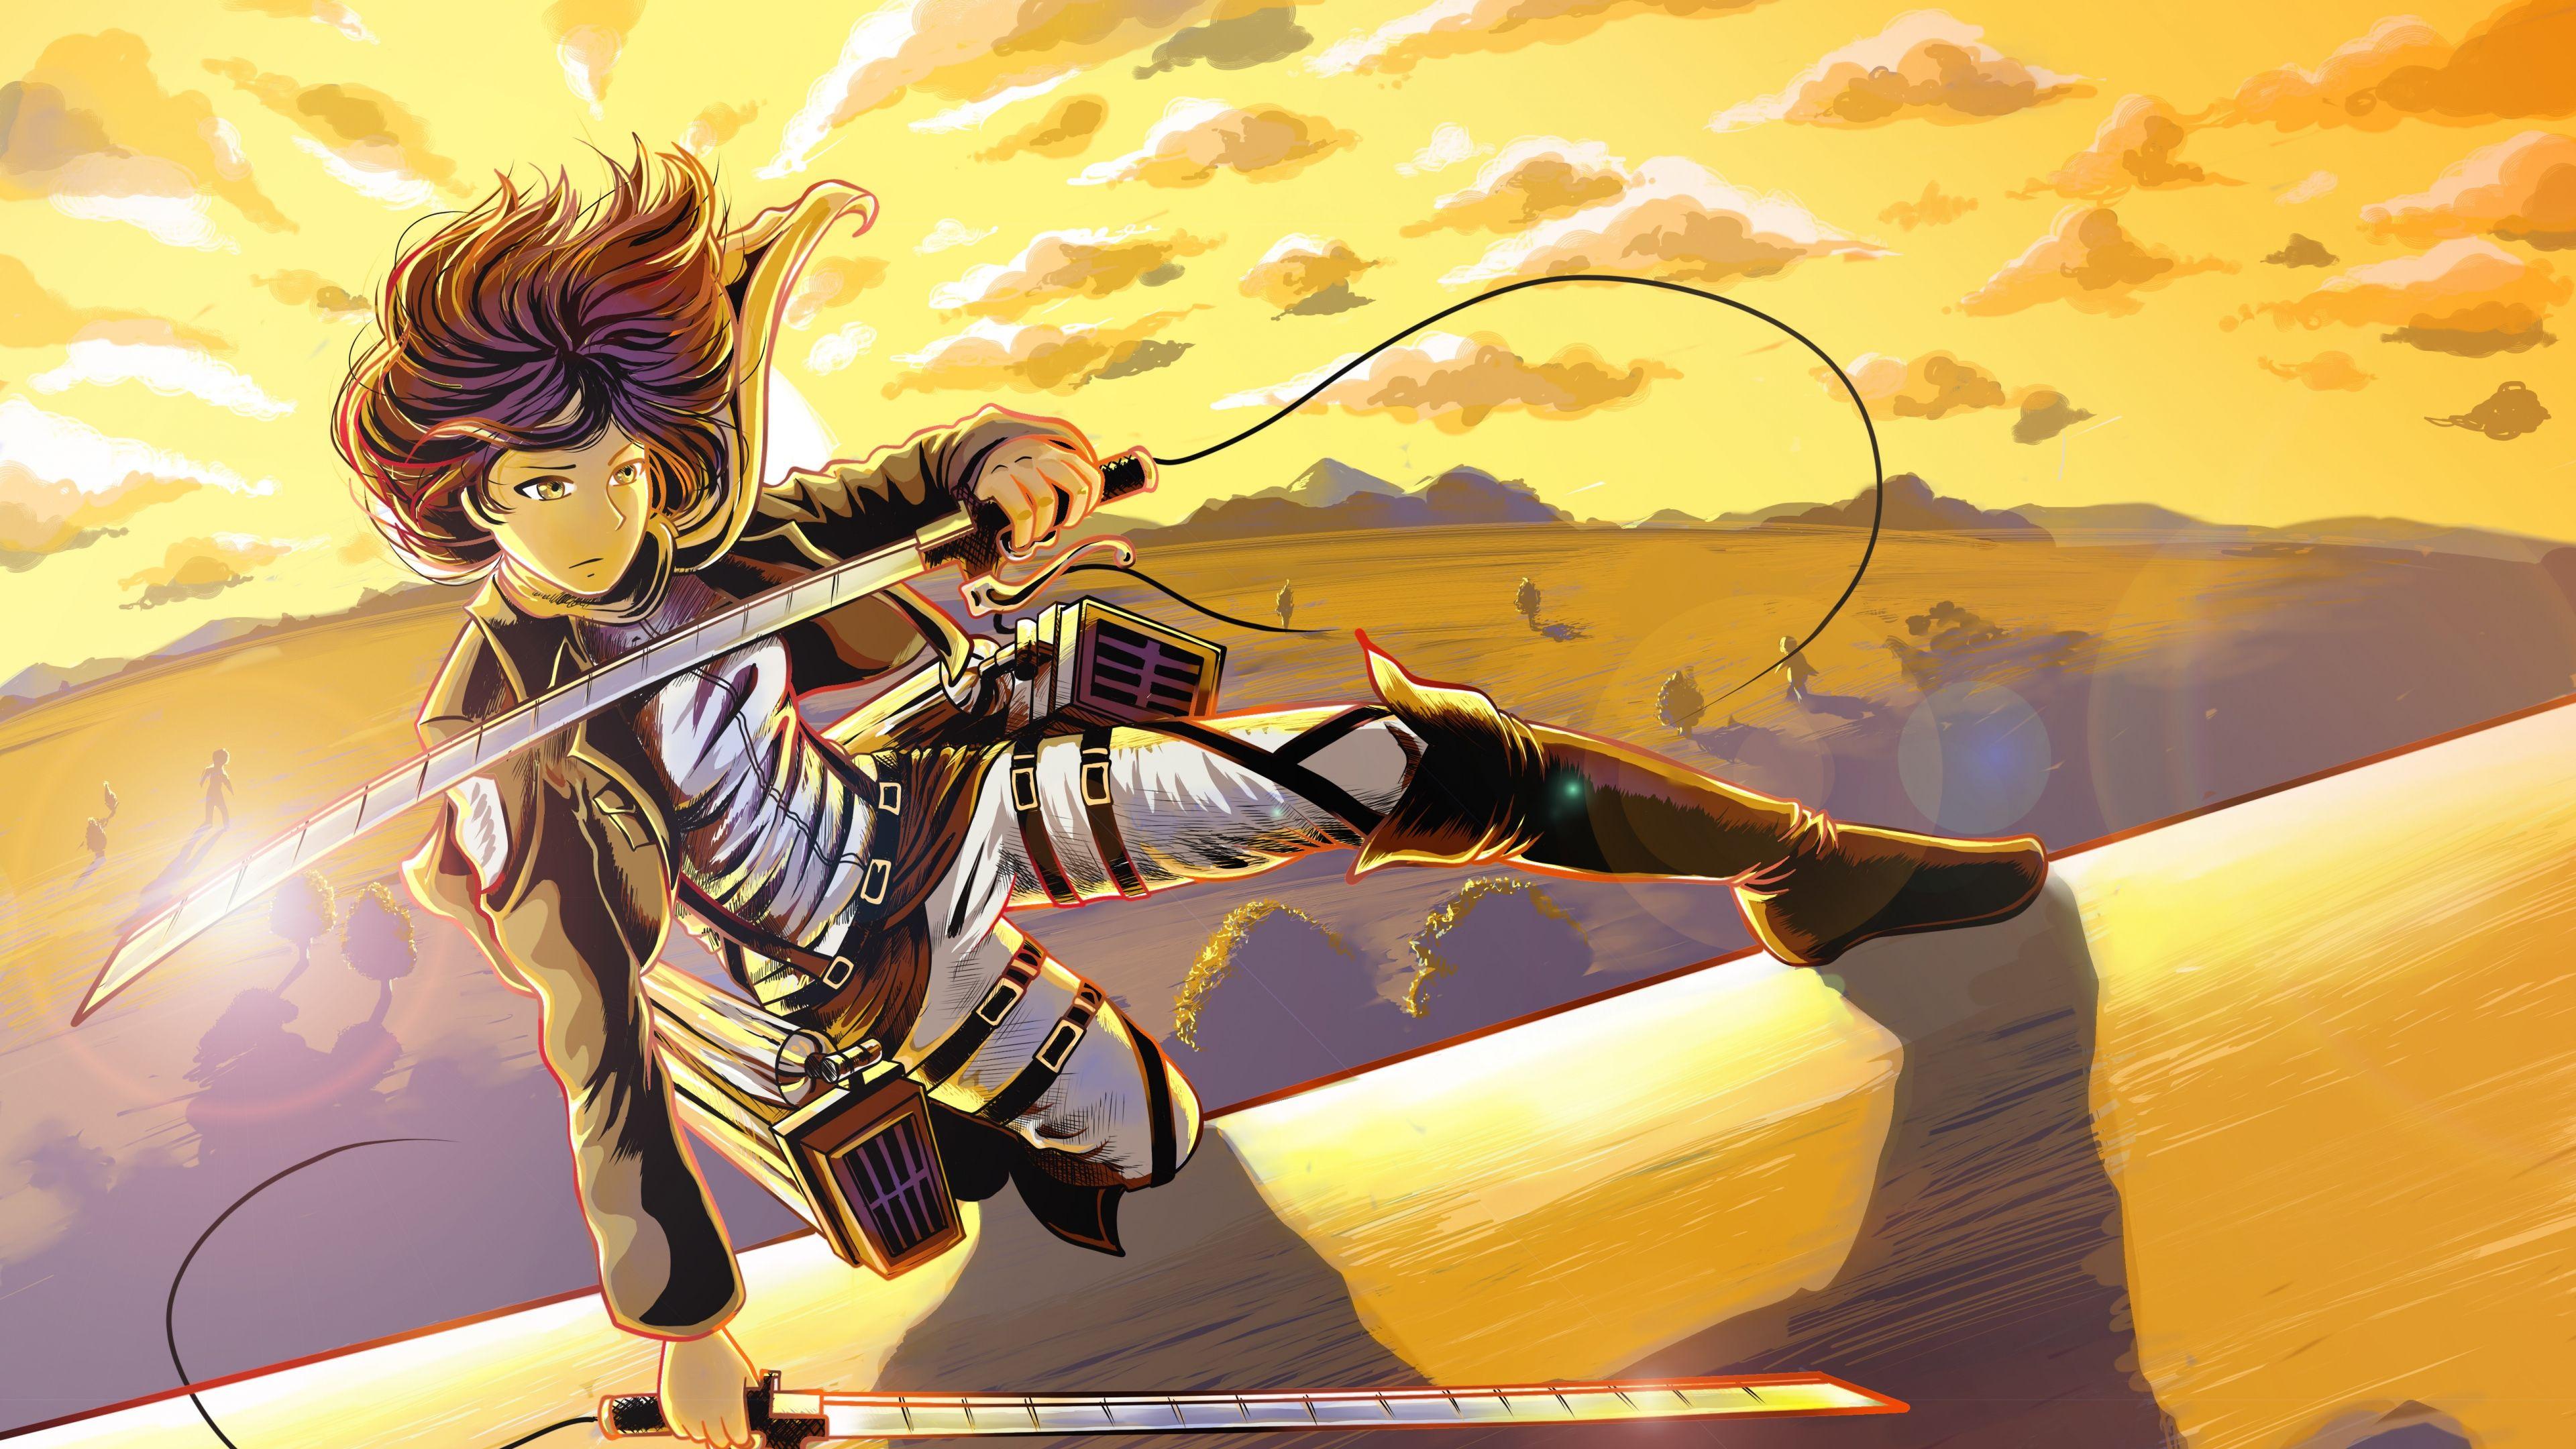 Luna Selenium Mikasa Weapon Sword (With images) Anime